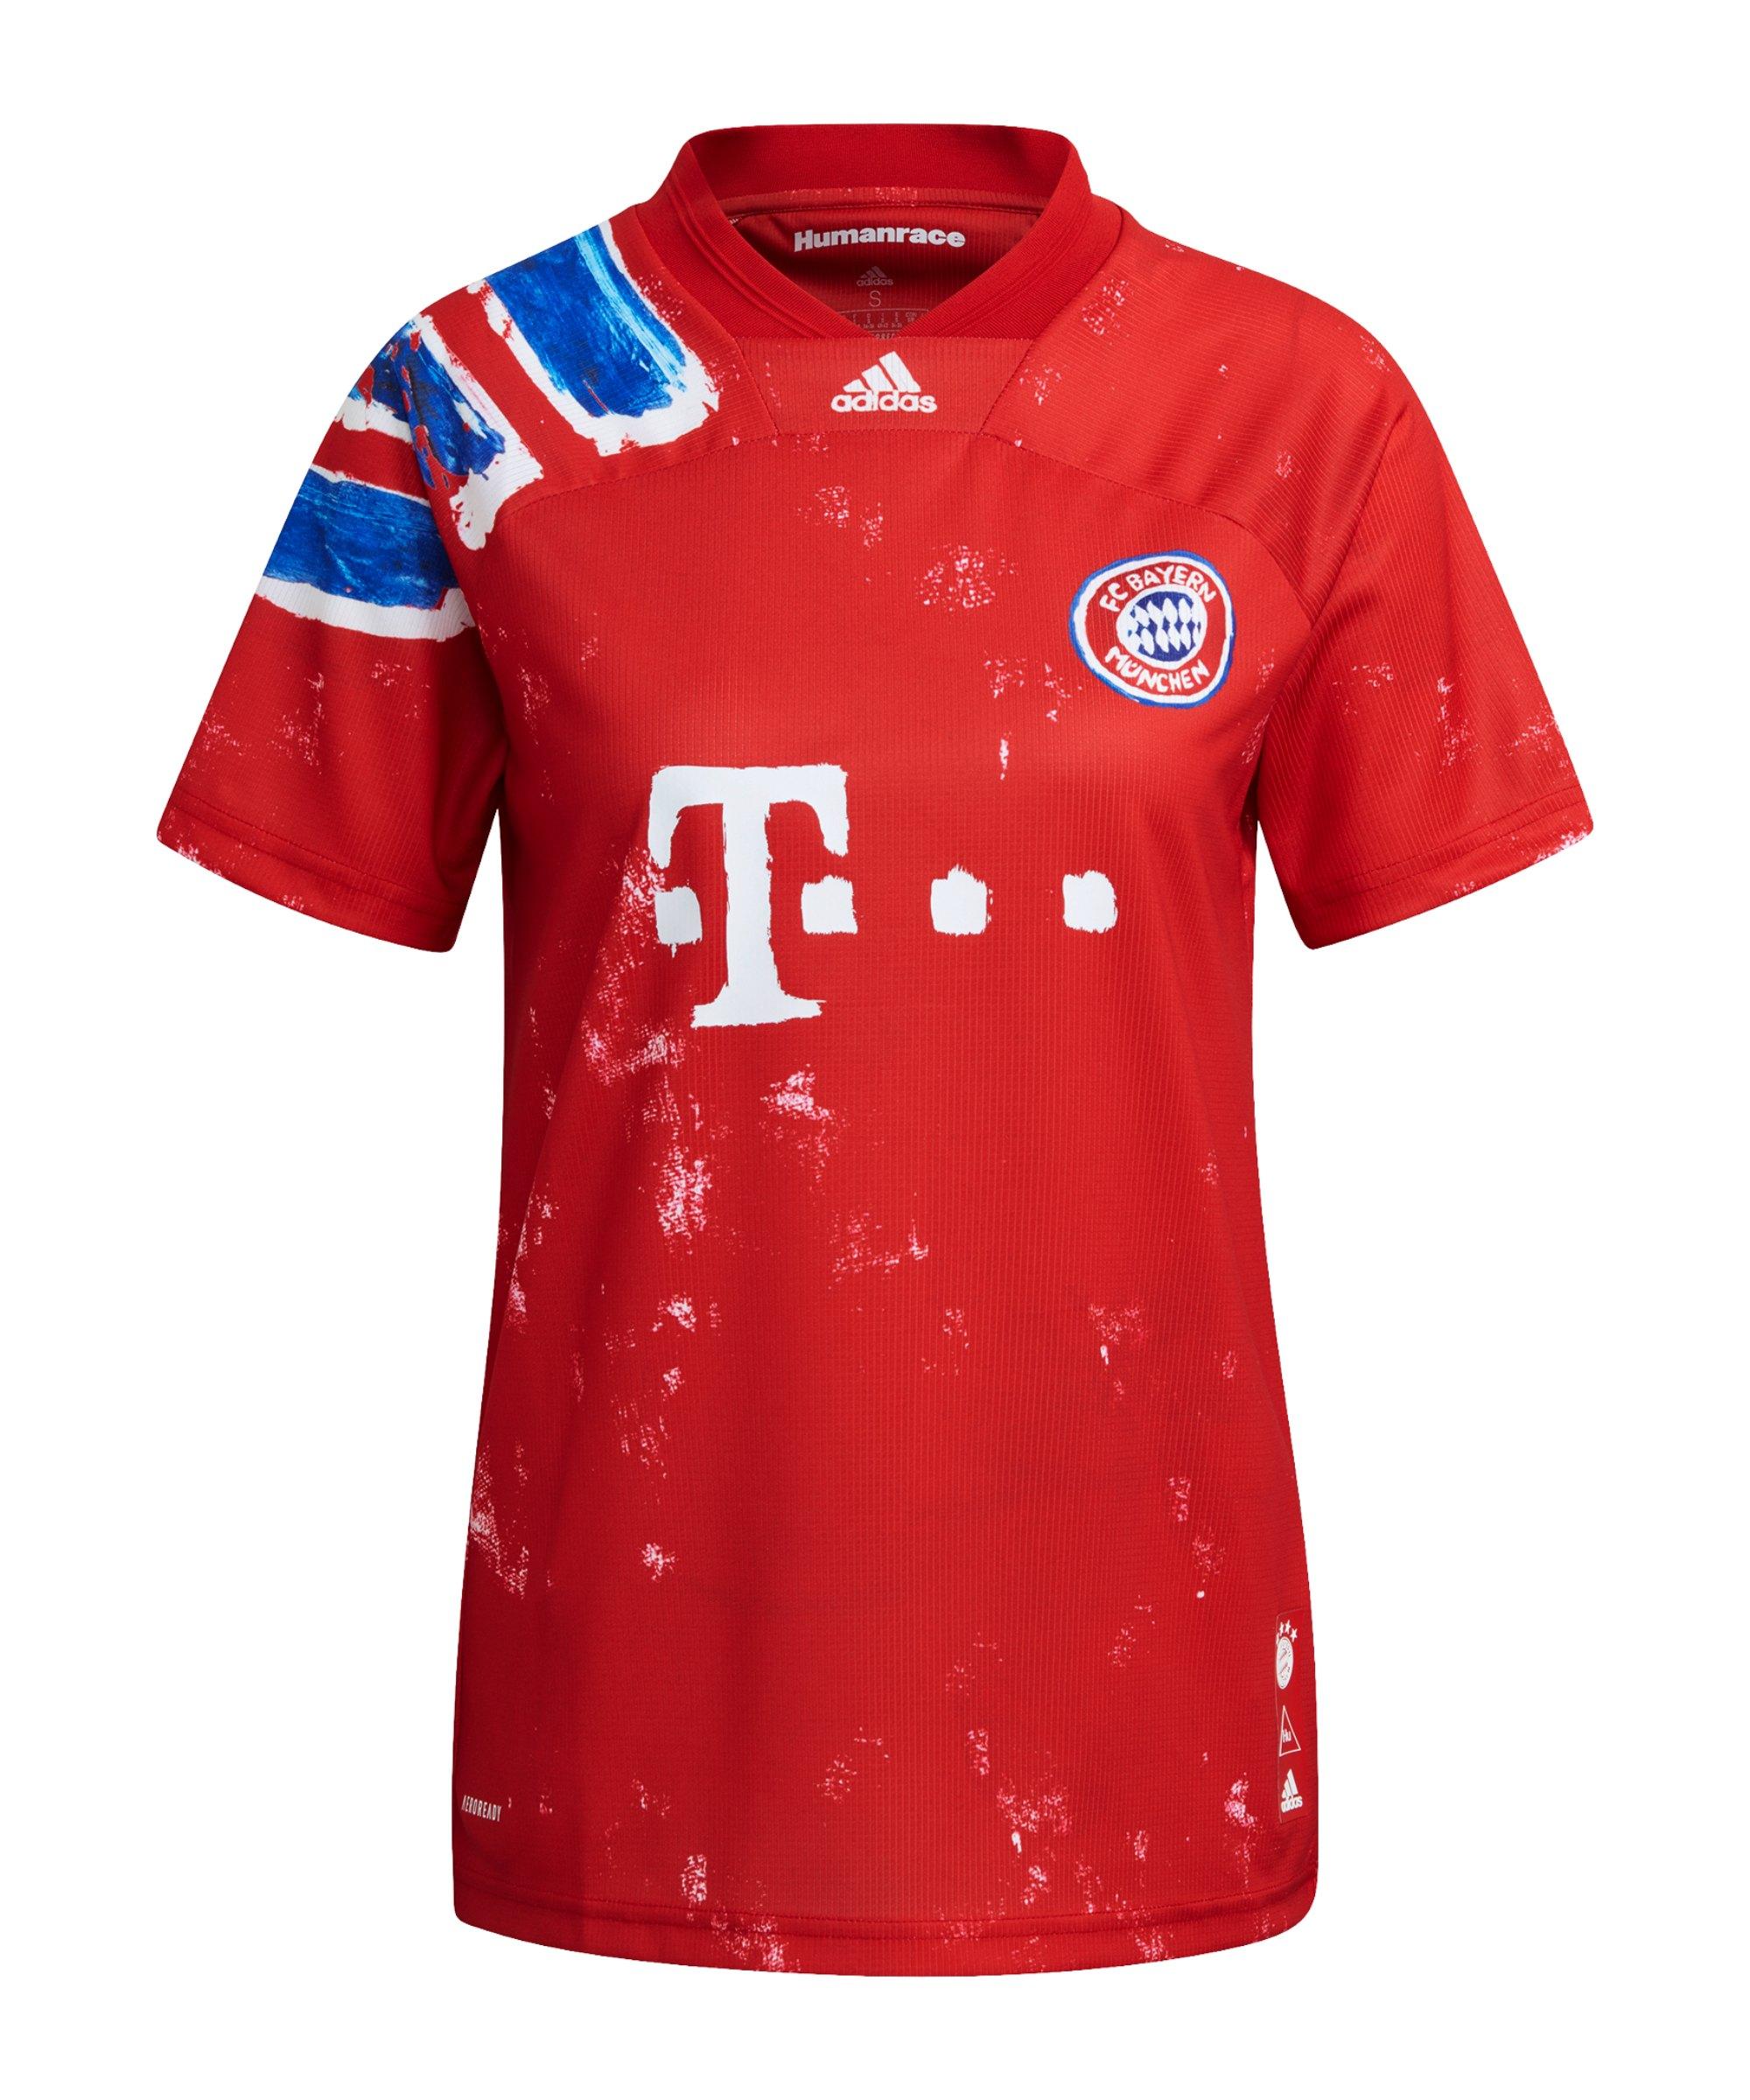 adidas FC Bayern München Human Race Trikot Damen Rot Weiss - rot